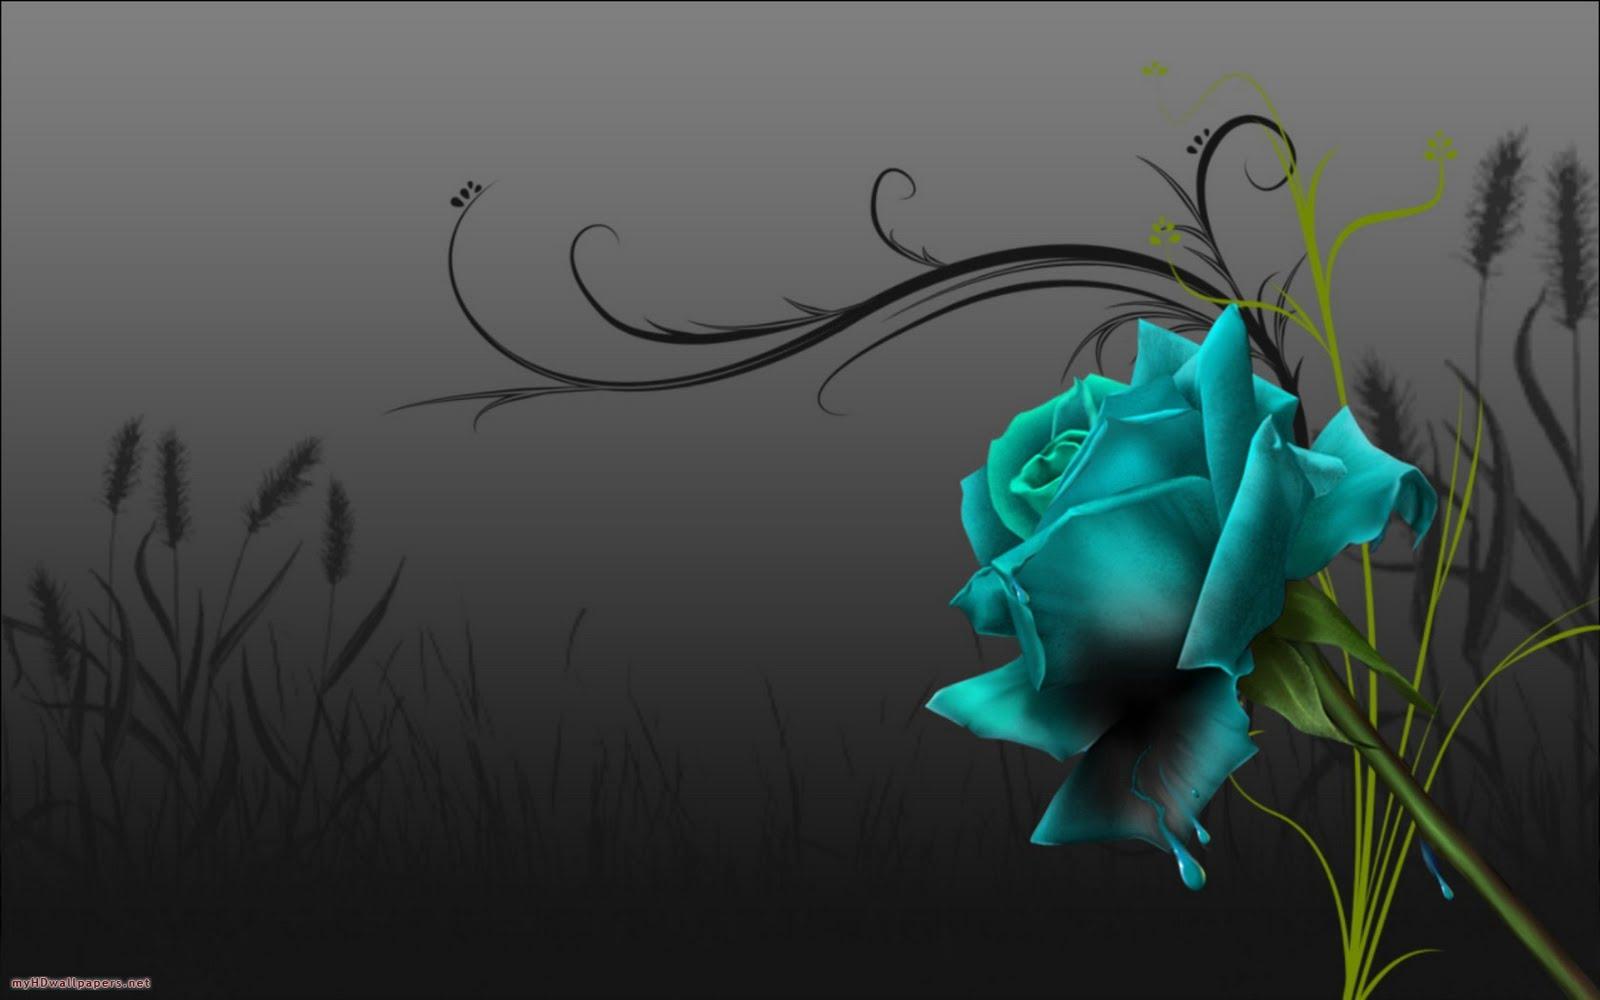 Hd wallpaper of blue rose hd wallpapers - Blue rose hd wallpaper download ...